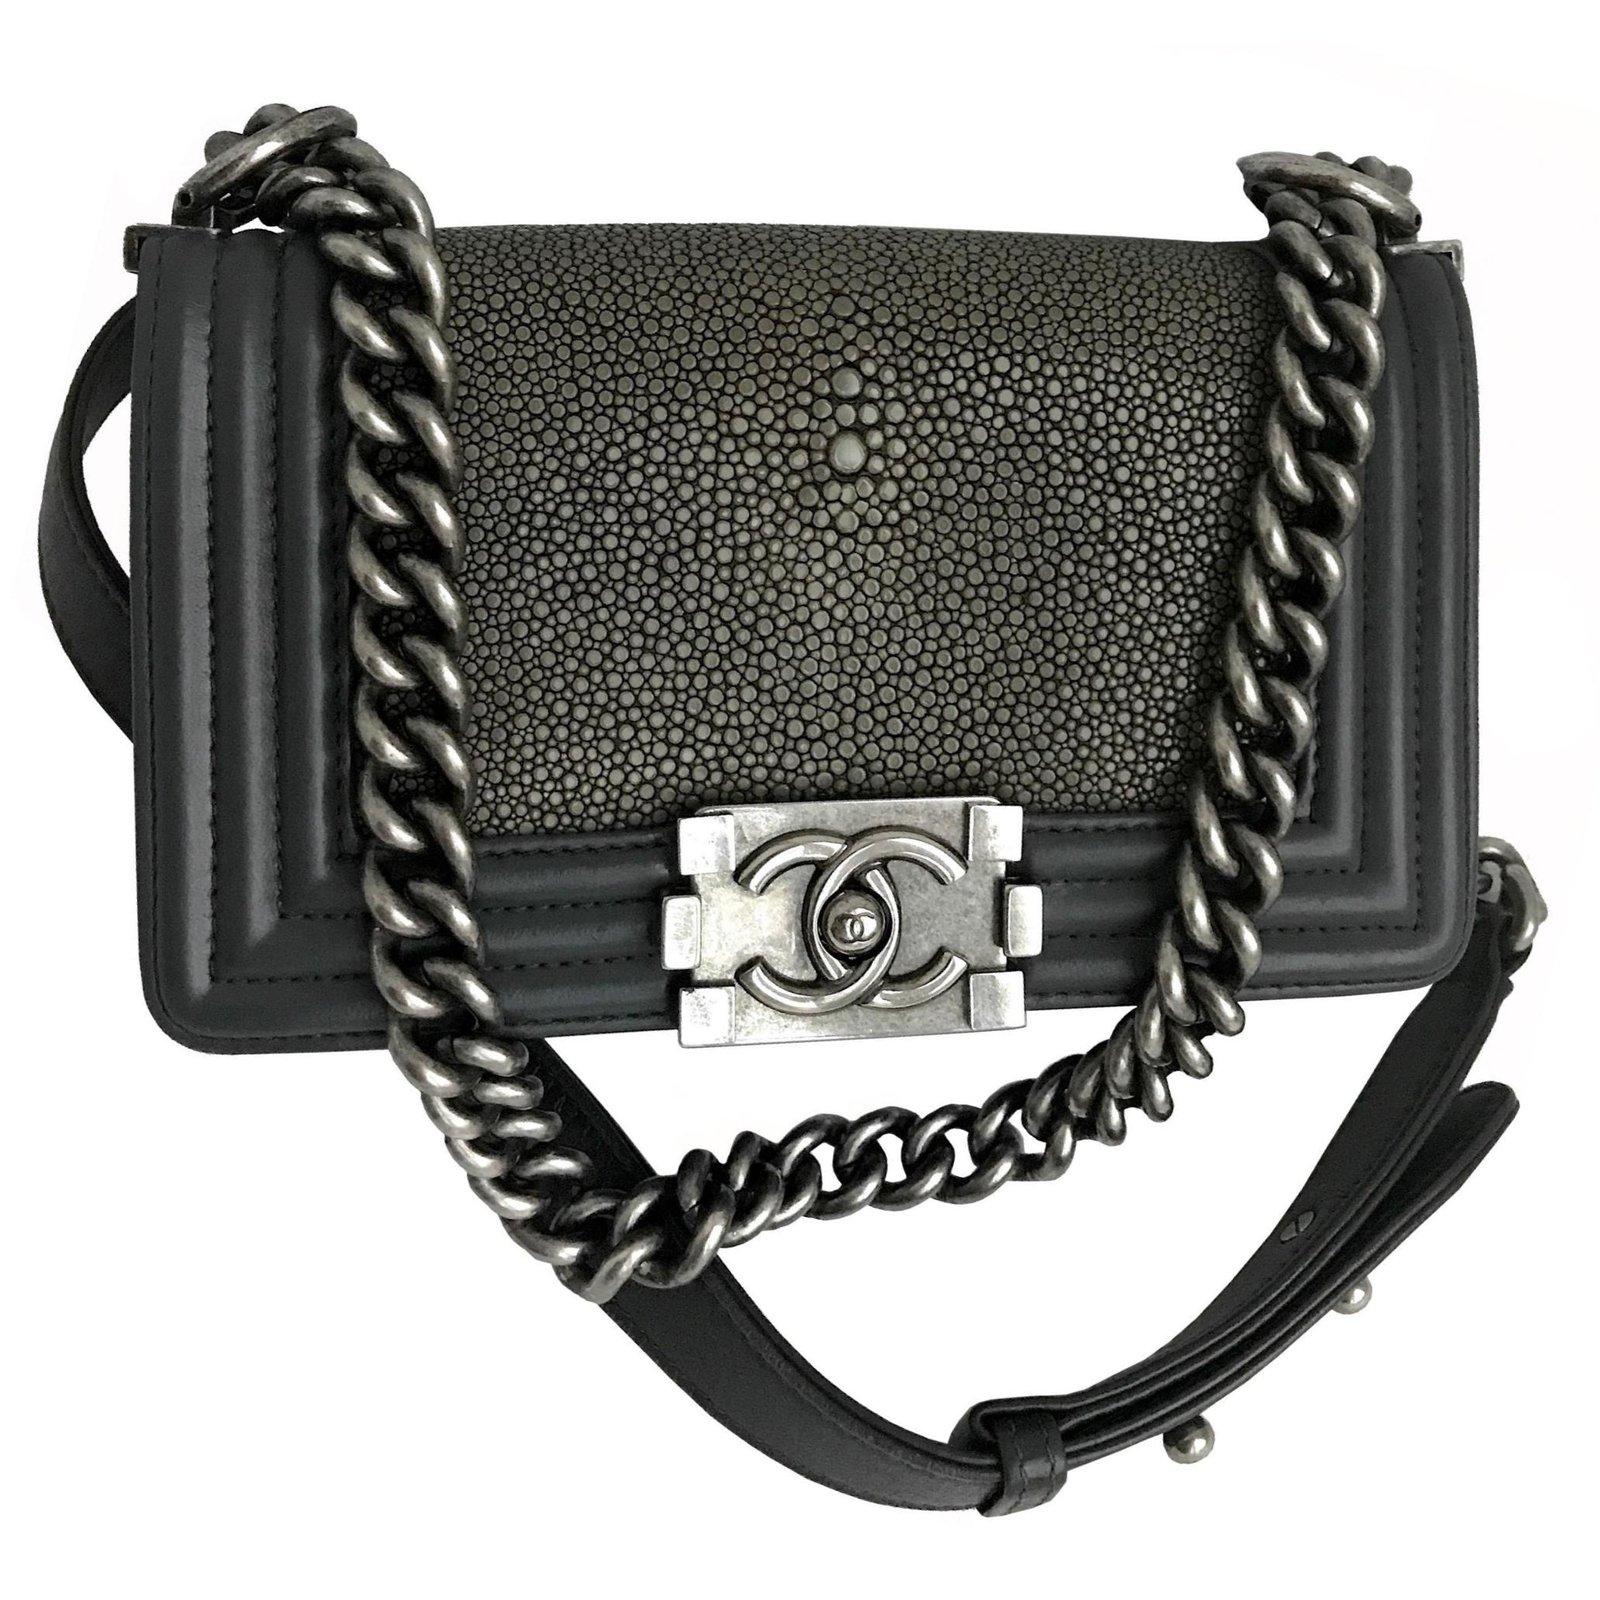 3ee644f85575 Chanel Stingray Boy Small Flap Bag Limited edition Handbags Leather,Exotic  leather Grey,Dark